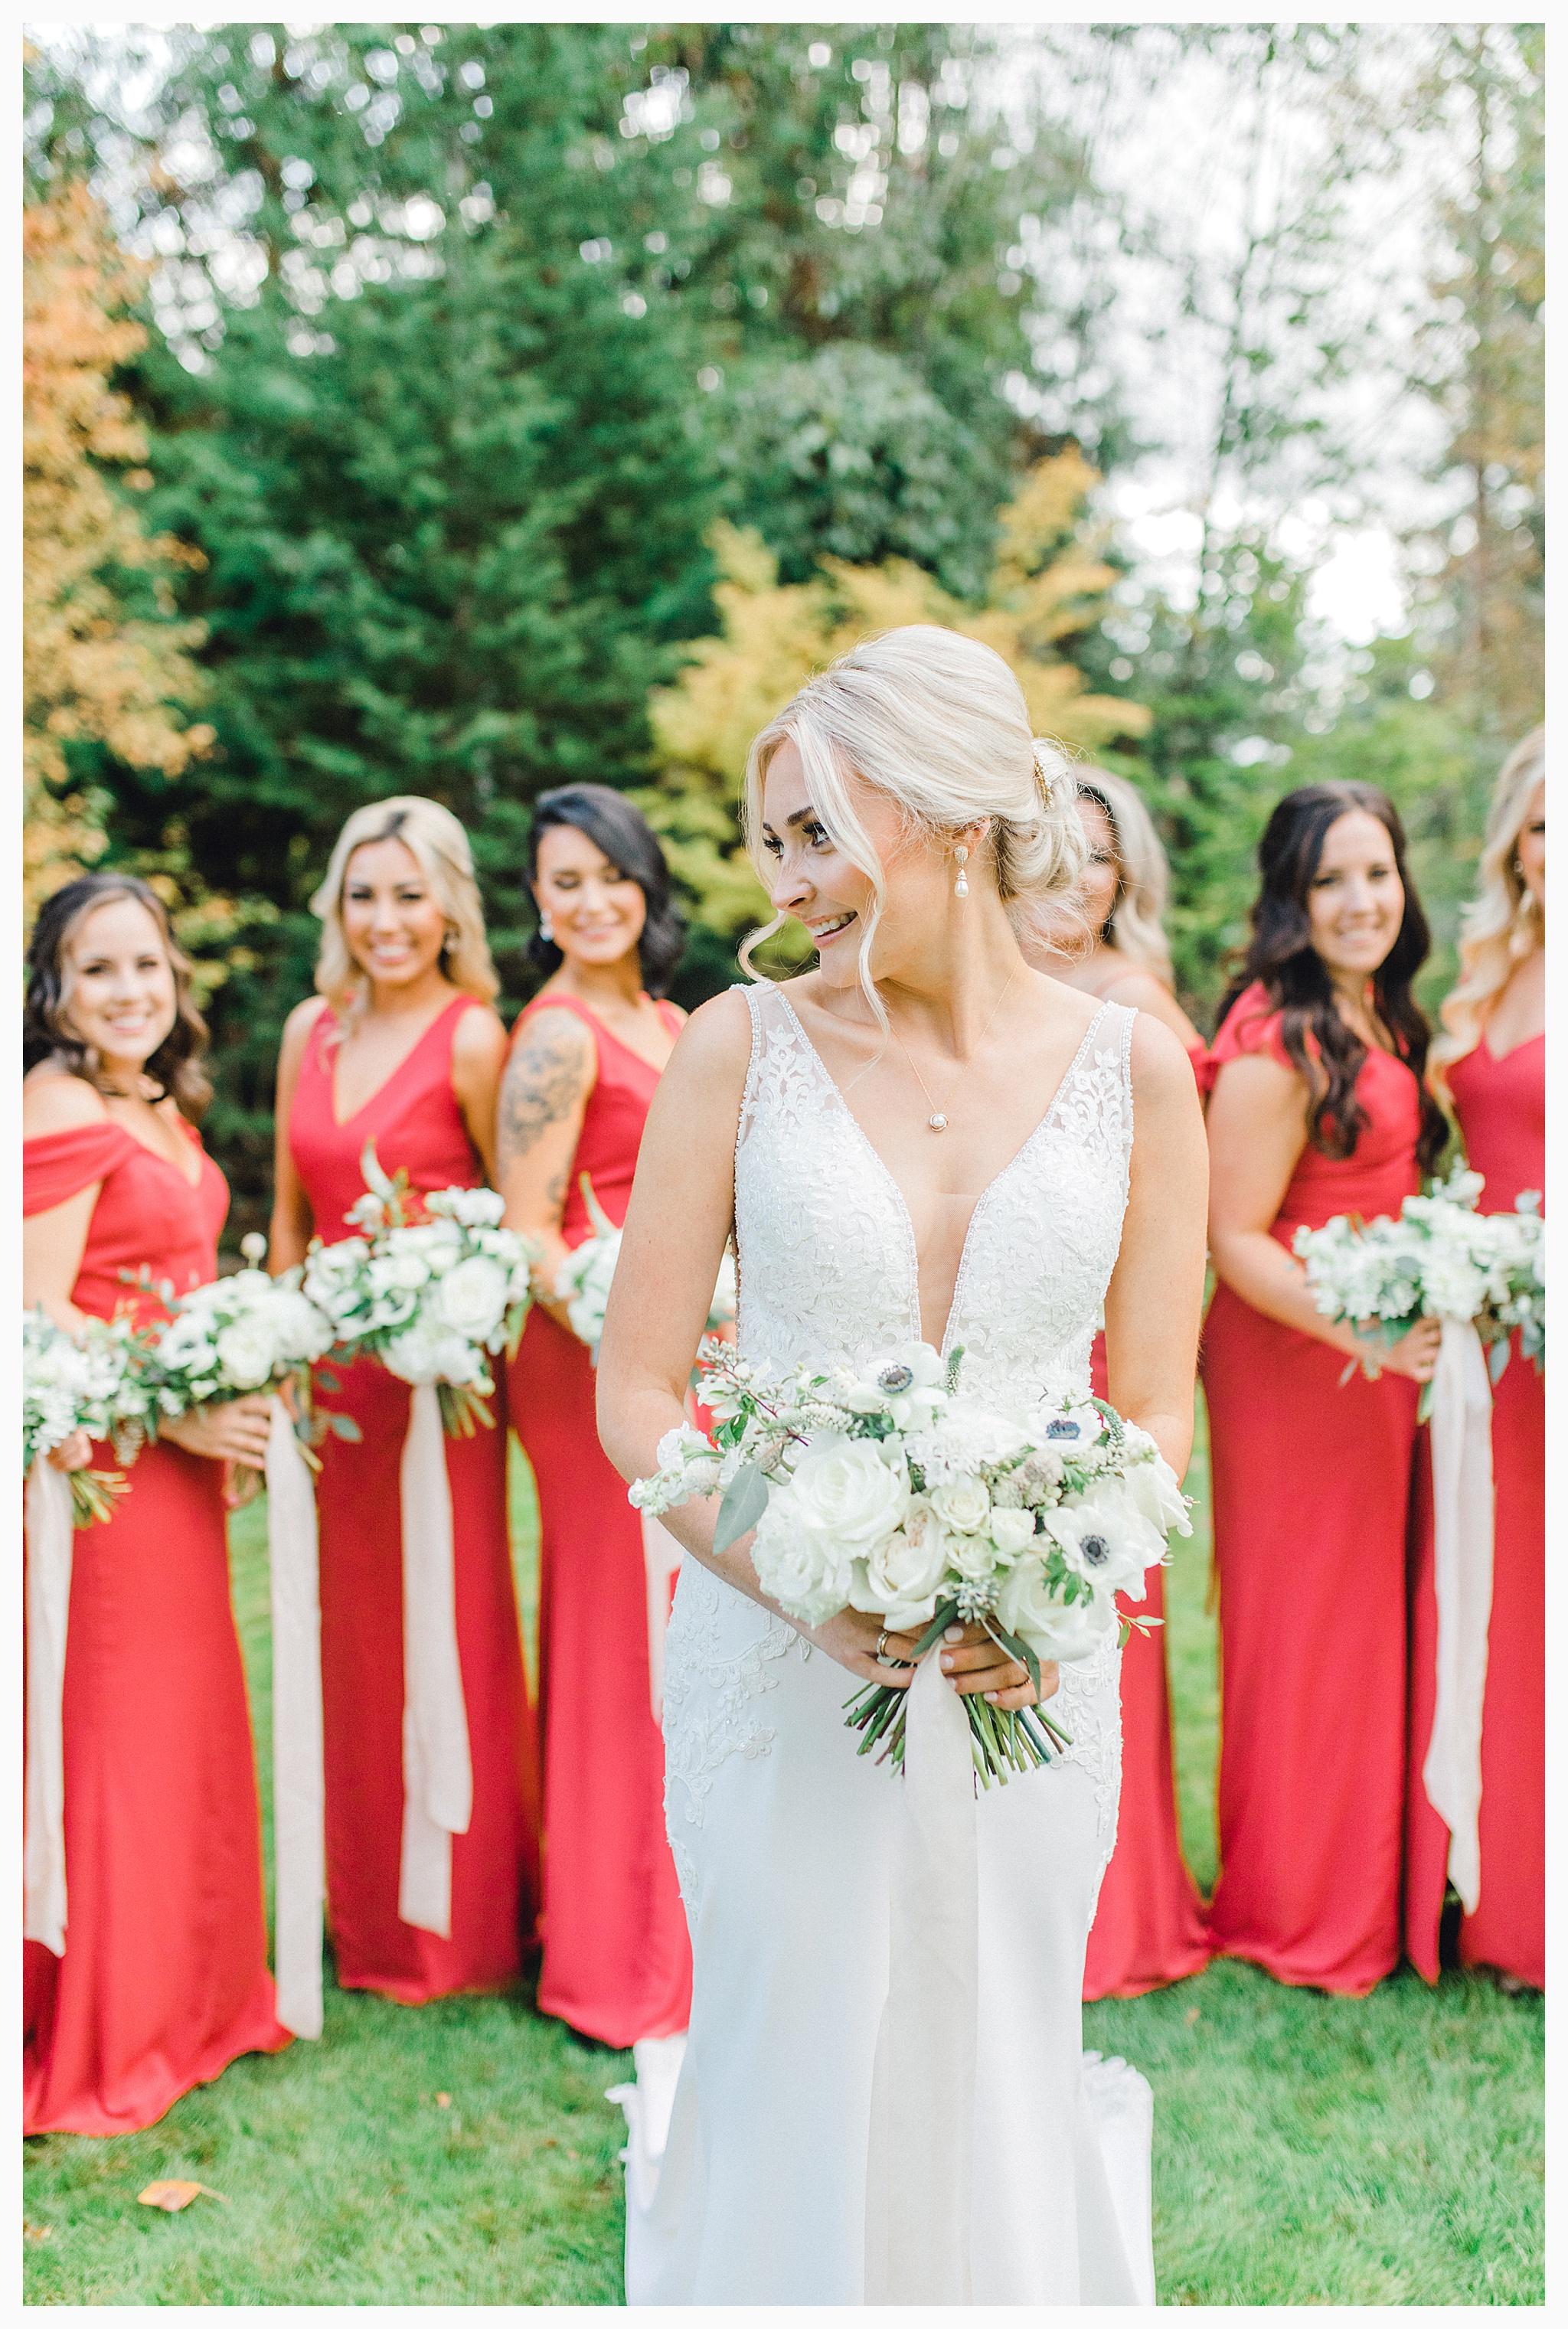 Emma Rose Company Light and Airy Wedding Photographer, Beautiful fall wedding at Rock Creek Gardens Venue in Puyallup, Washington._0054.jpg